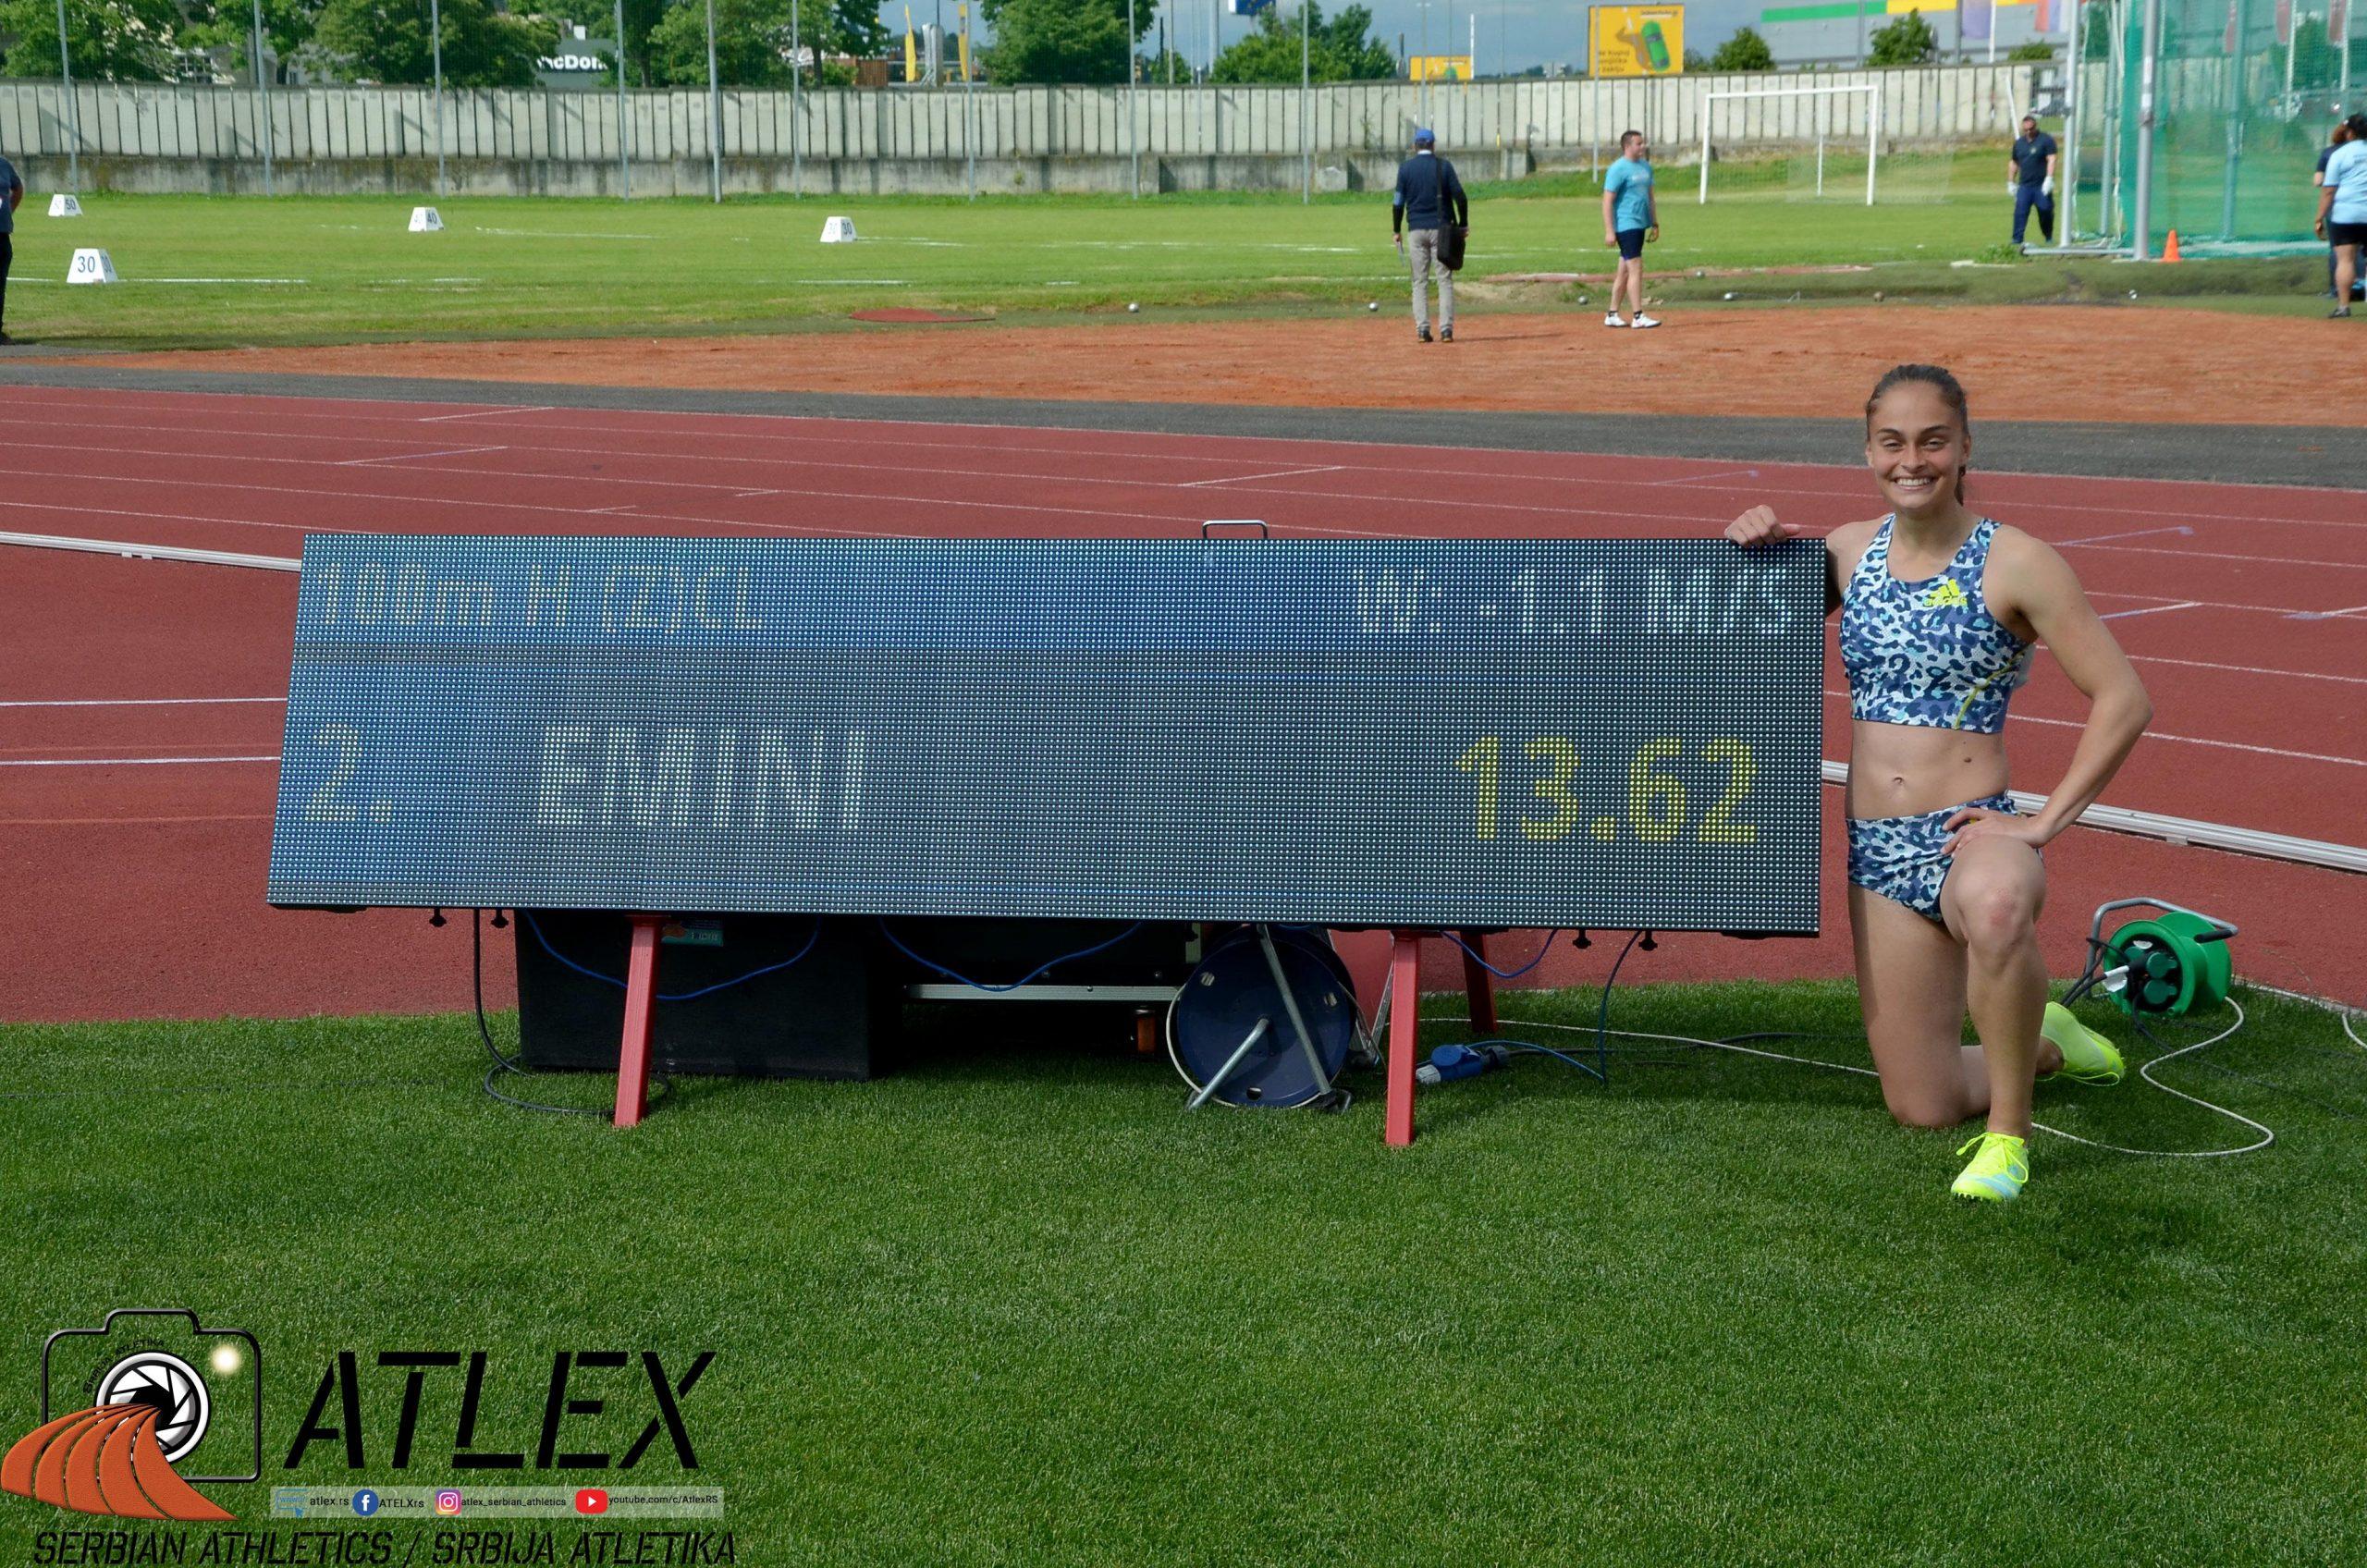 Milica Emini, novi lični rekord